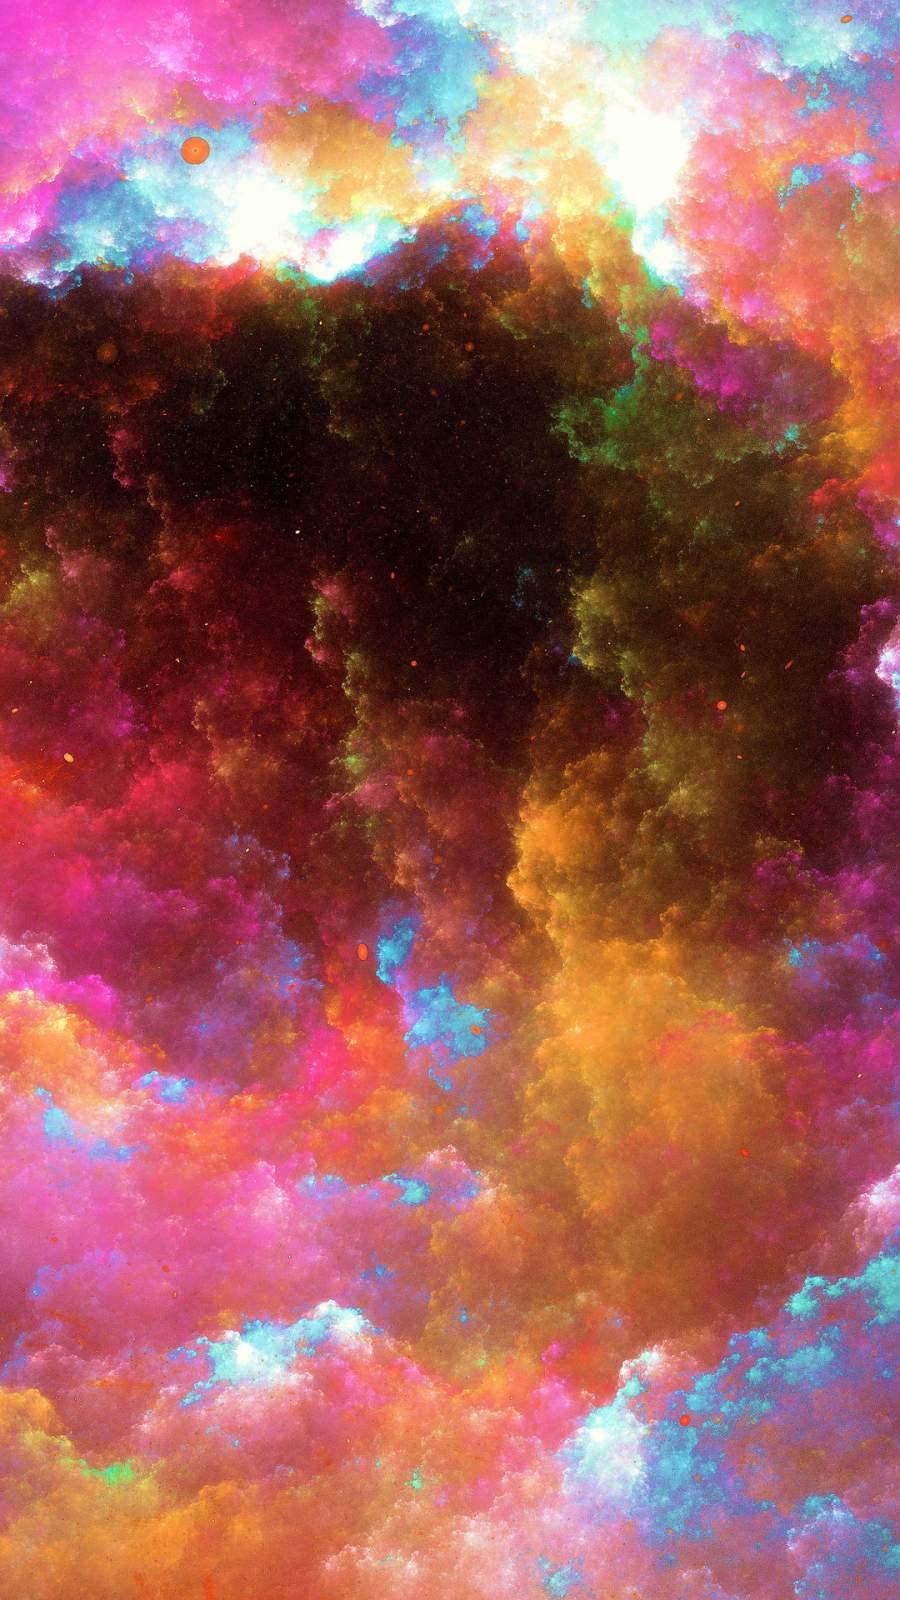 Colorful Nebula Digital Art iPhone Wallpaper